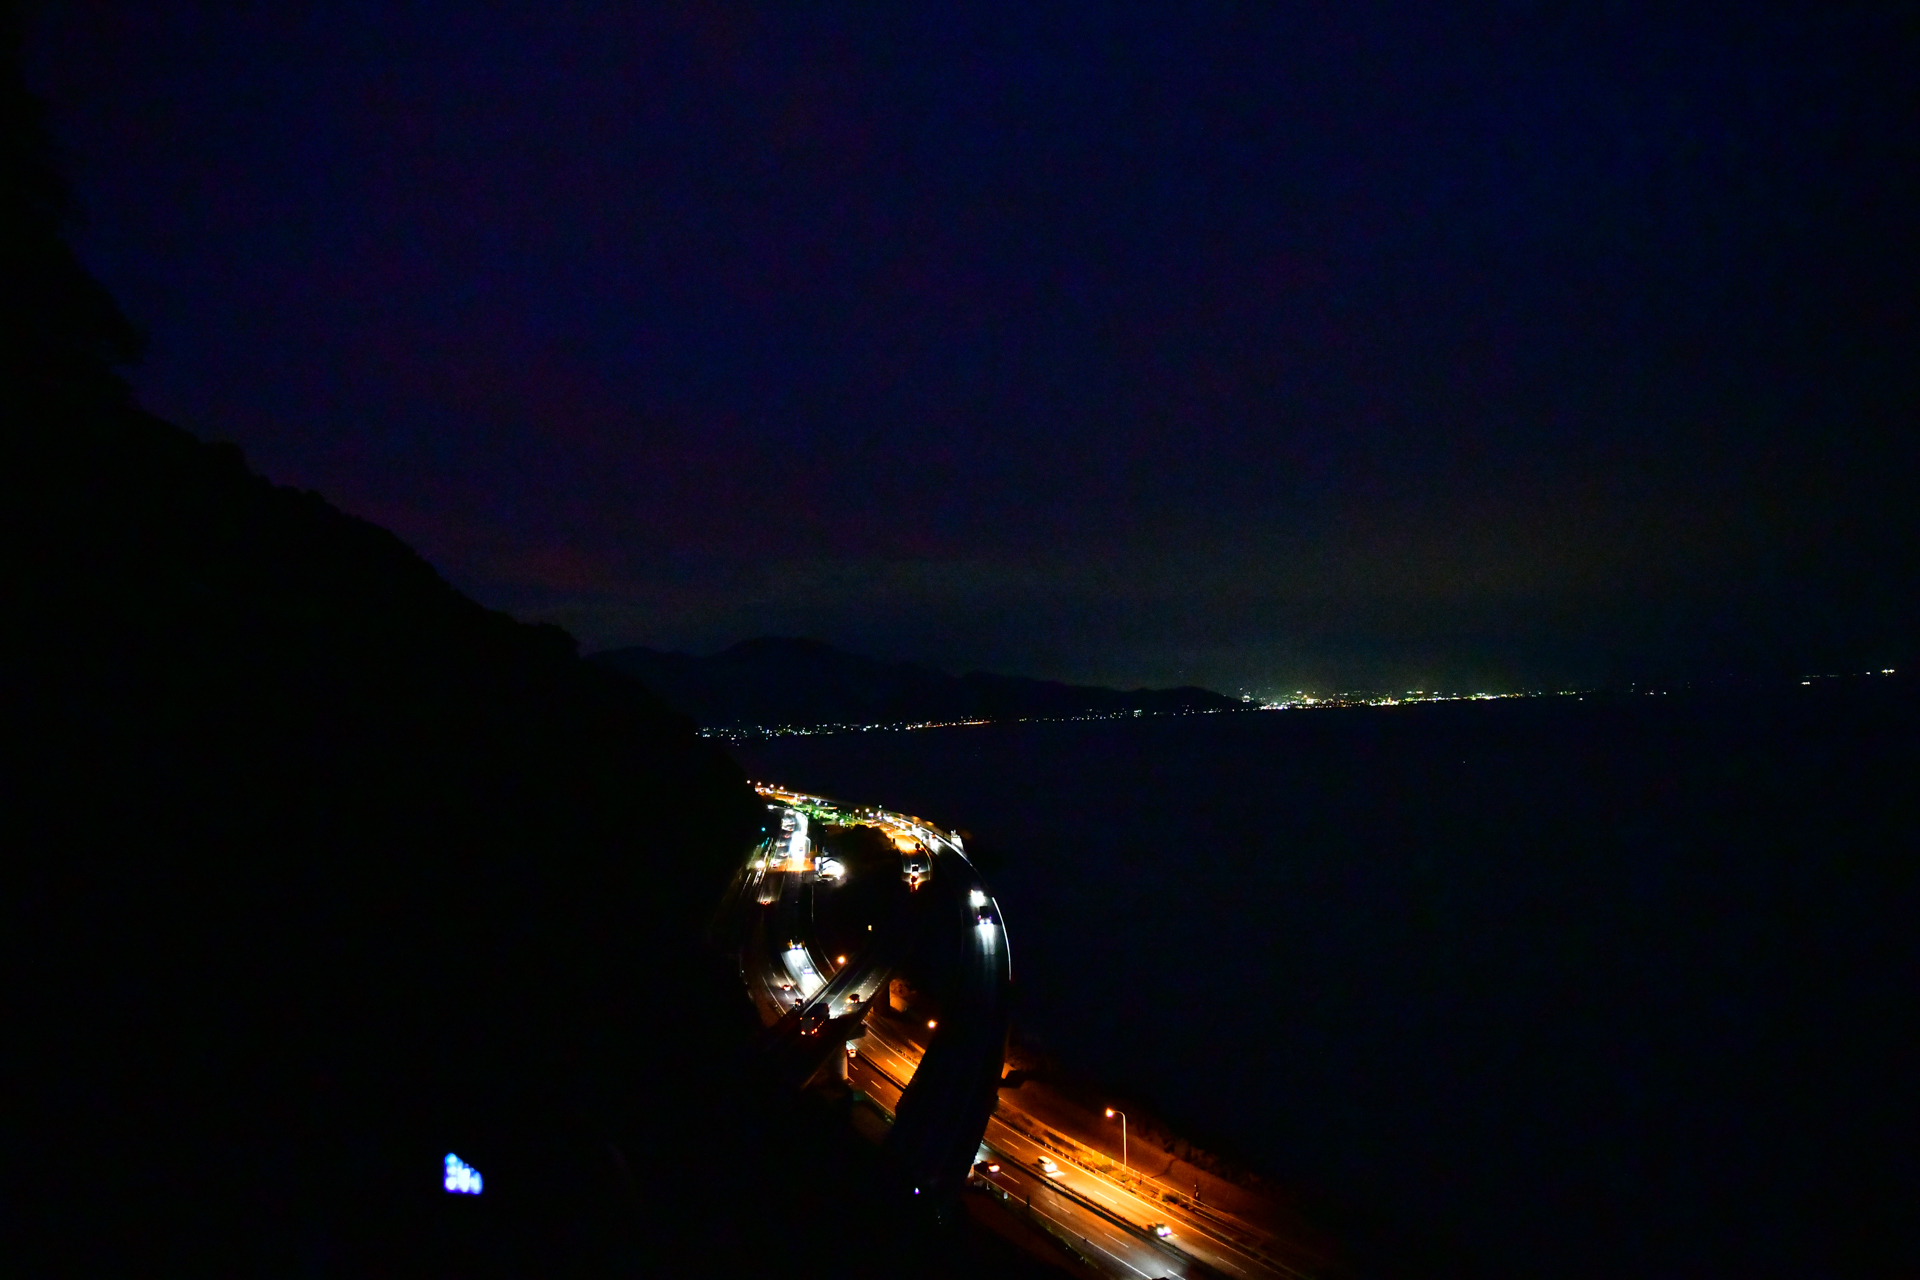 薩た峠 東名高速道路 夜景 D850+SP 24-70mm F/2.8 Di VC USD G2